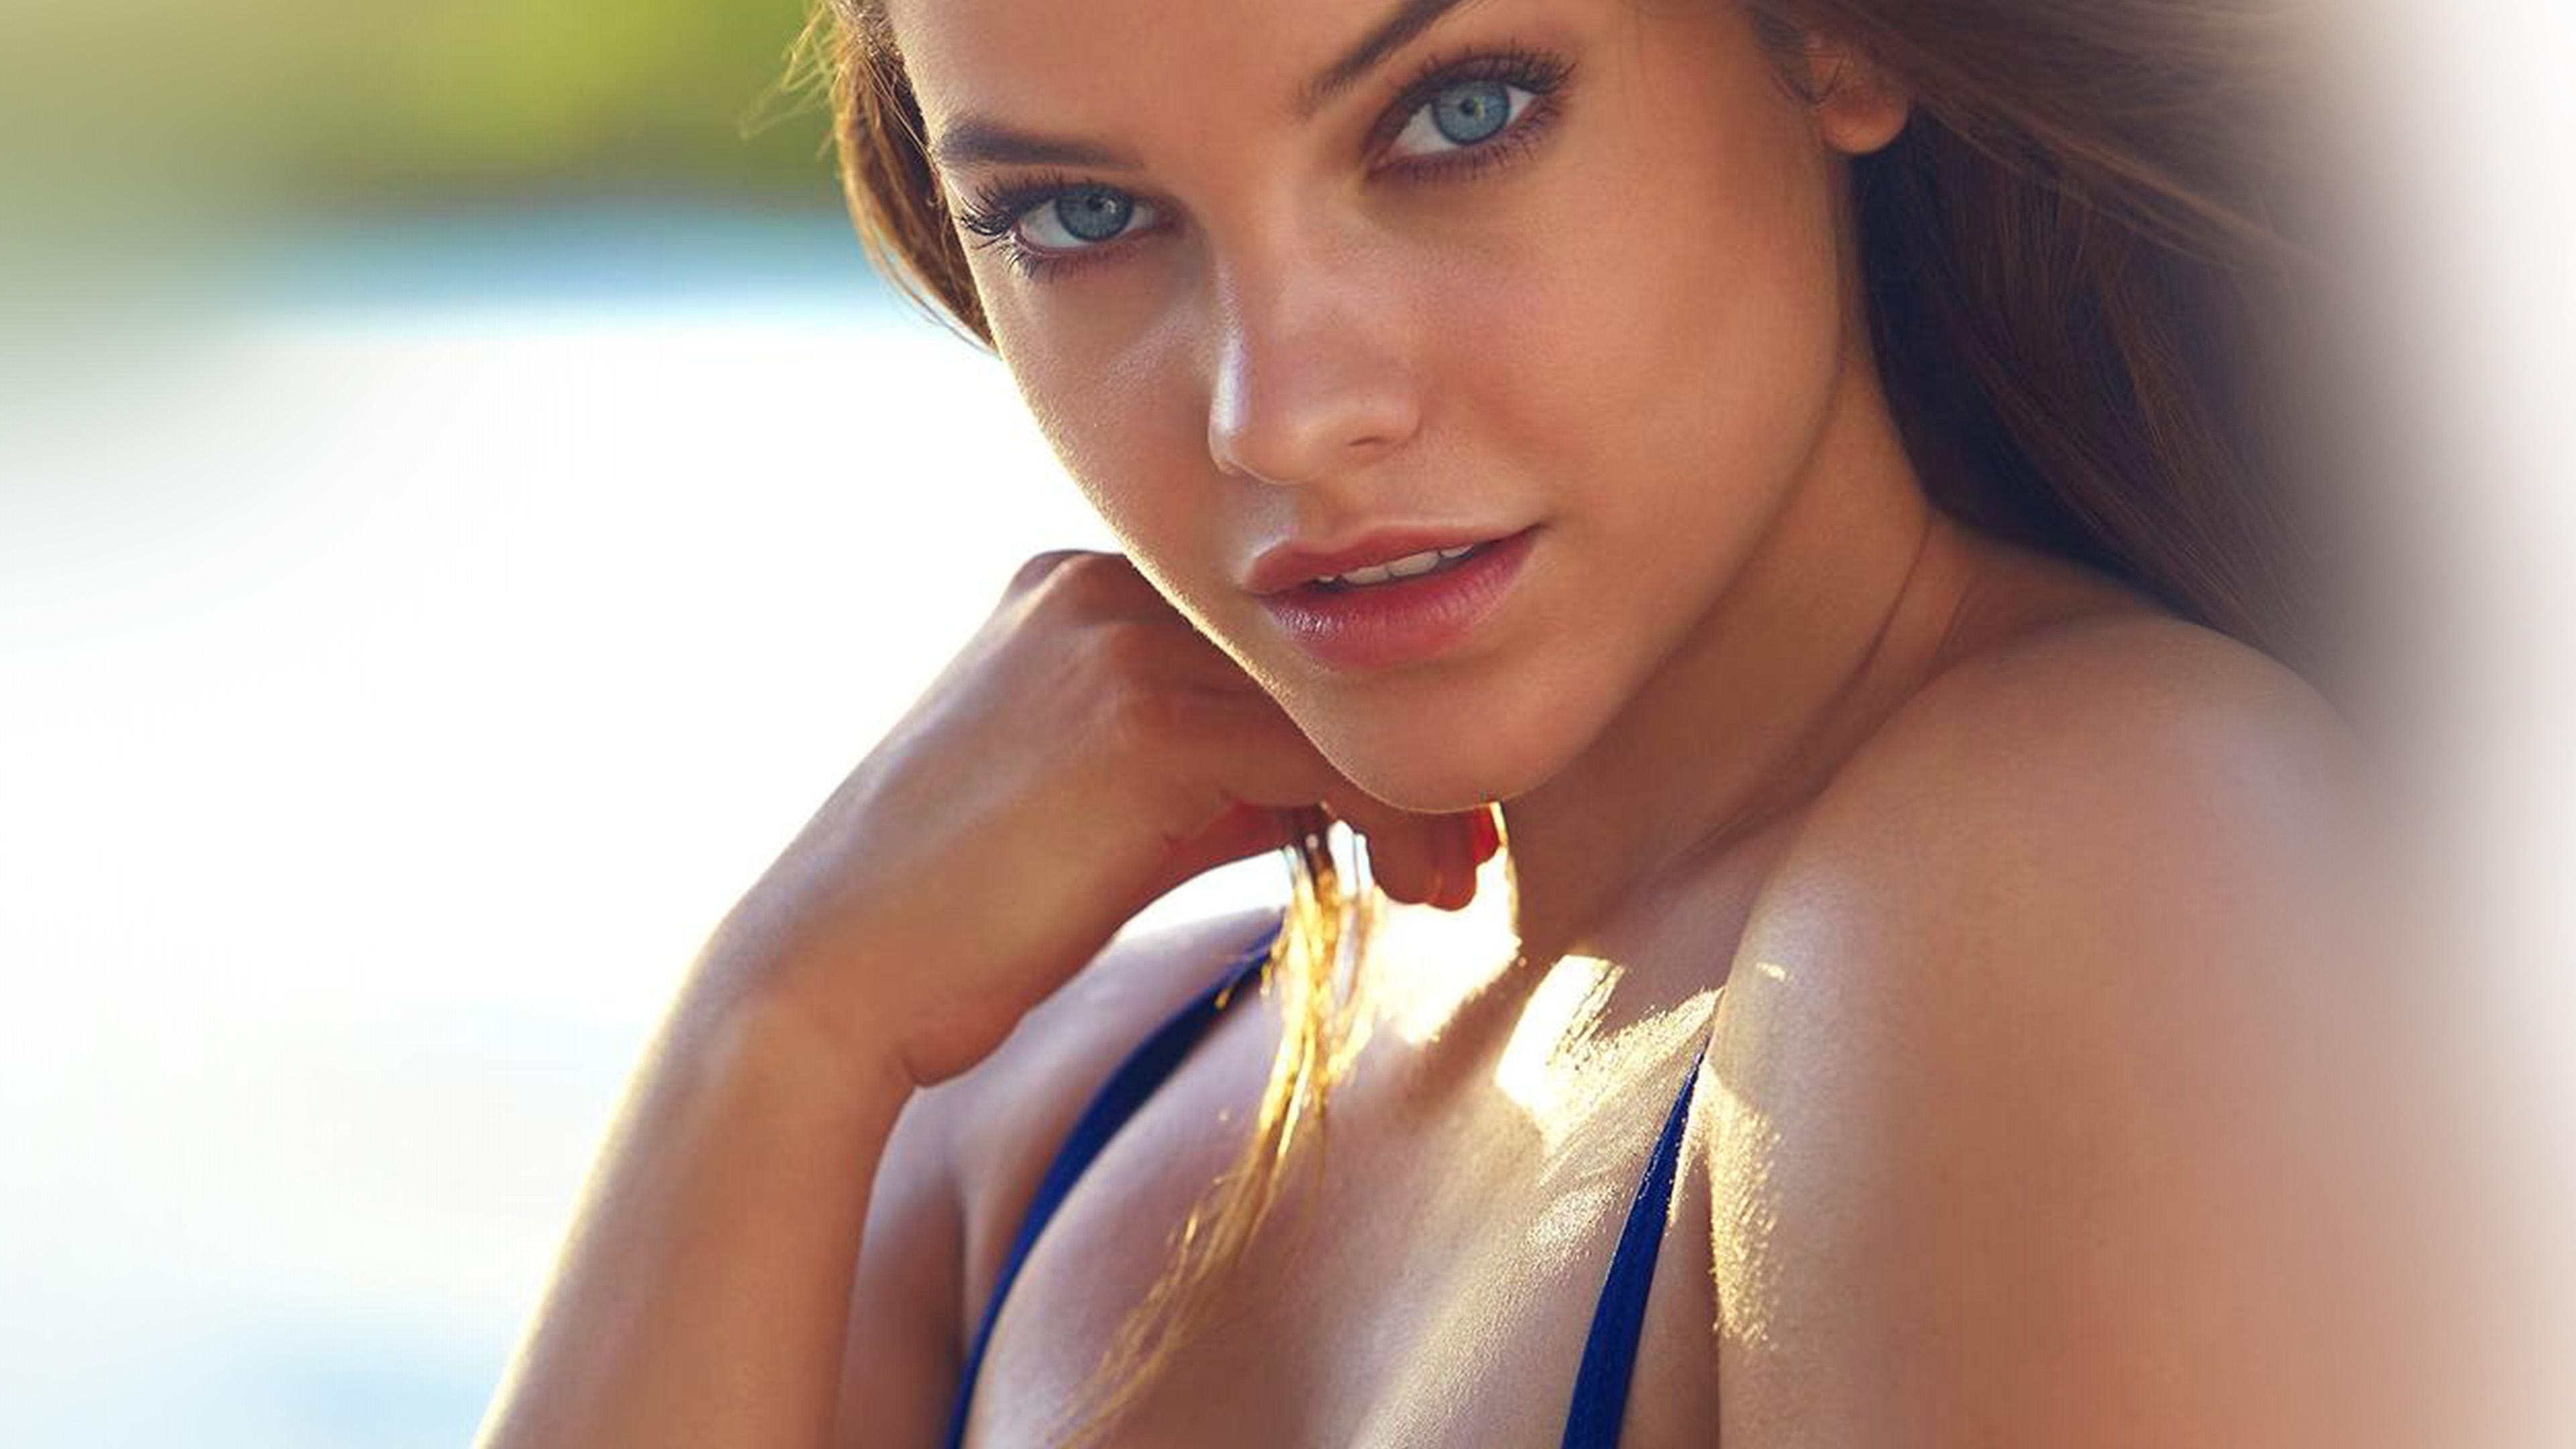 Serinda swan nude leaks 7 Photos,Chelsea Lynn Pezzola See Through - 29 Photos Erotic nude Cristina Ache Amor Bandido - BR,Sandra lambeck nude